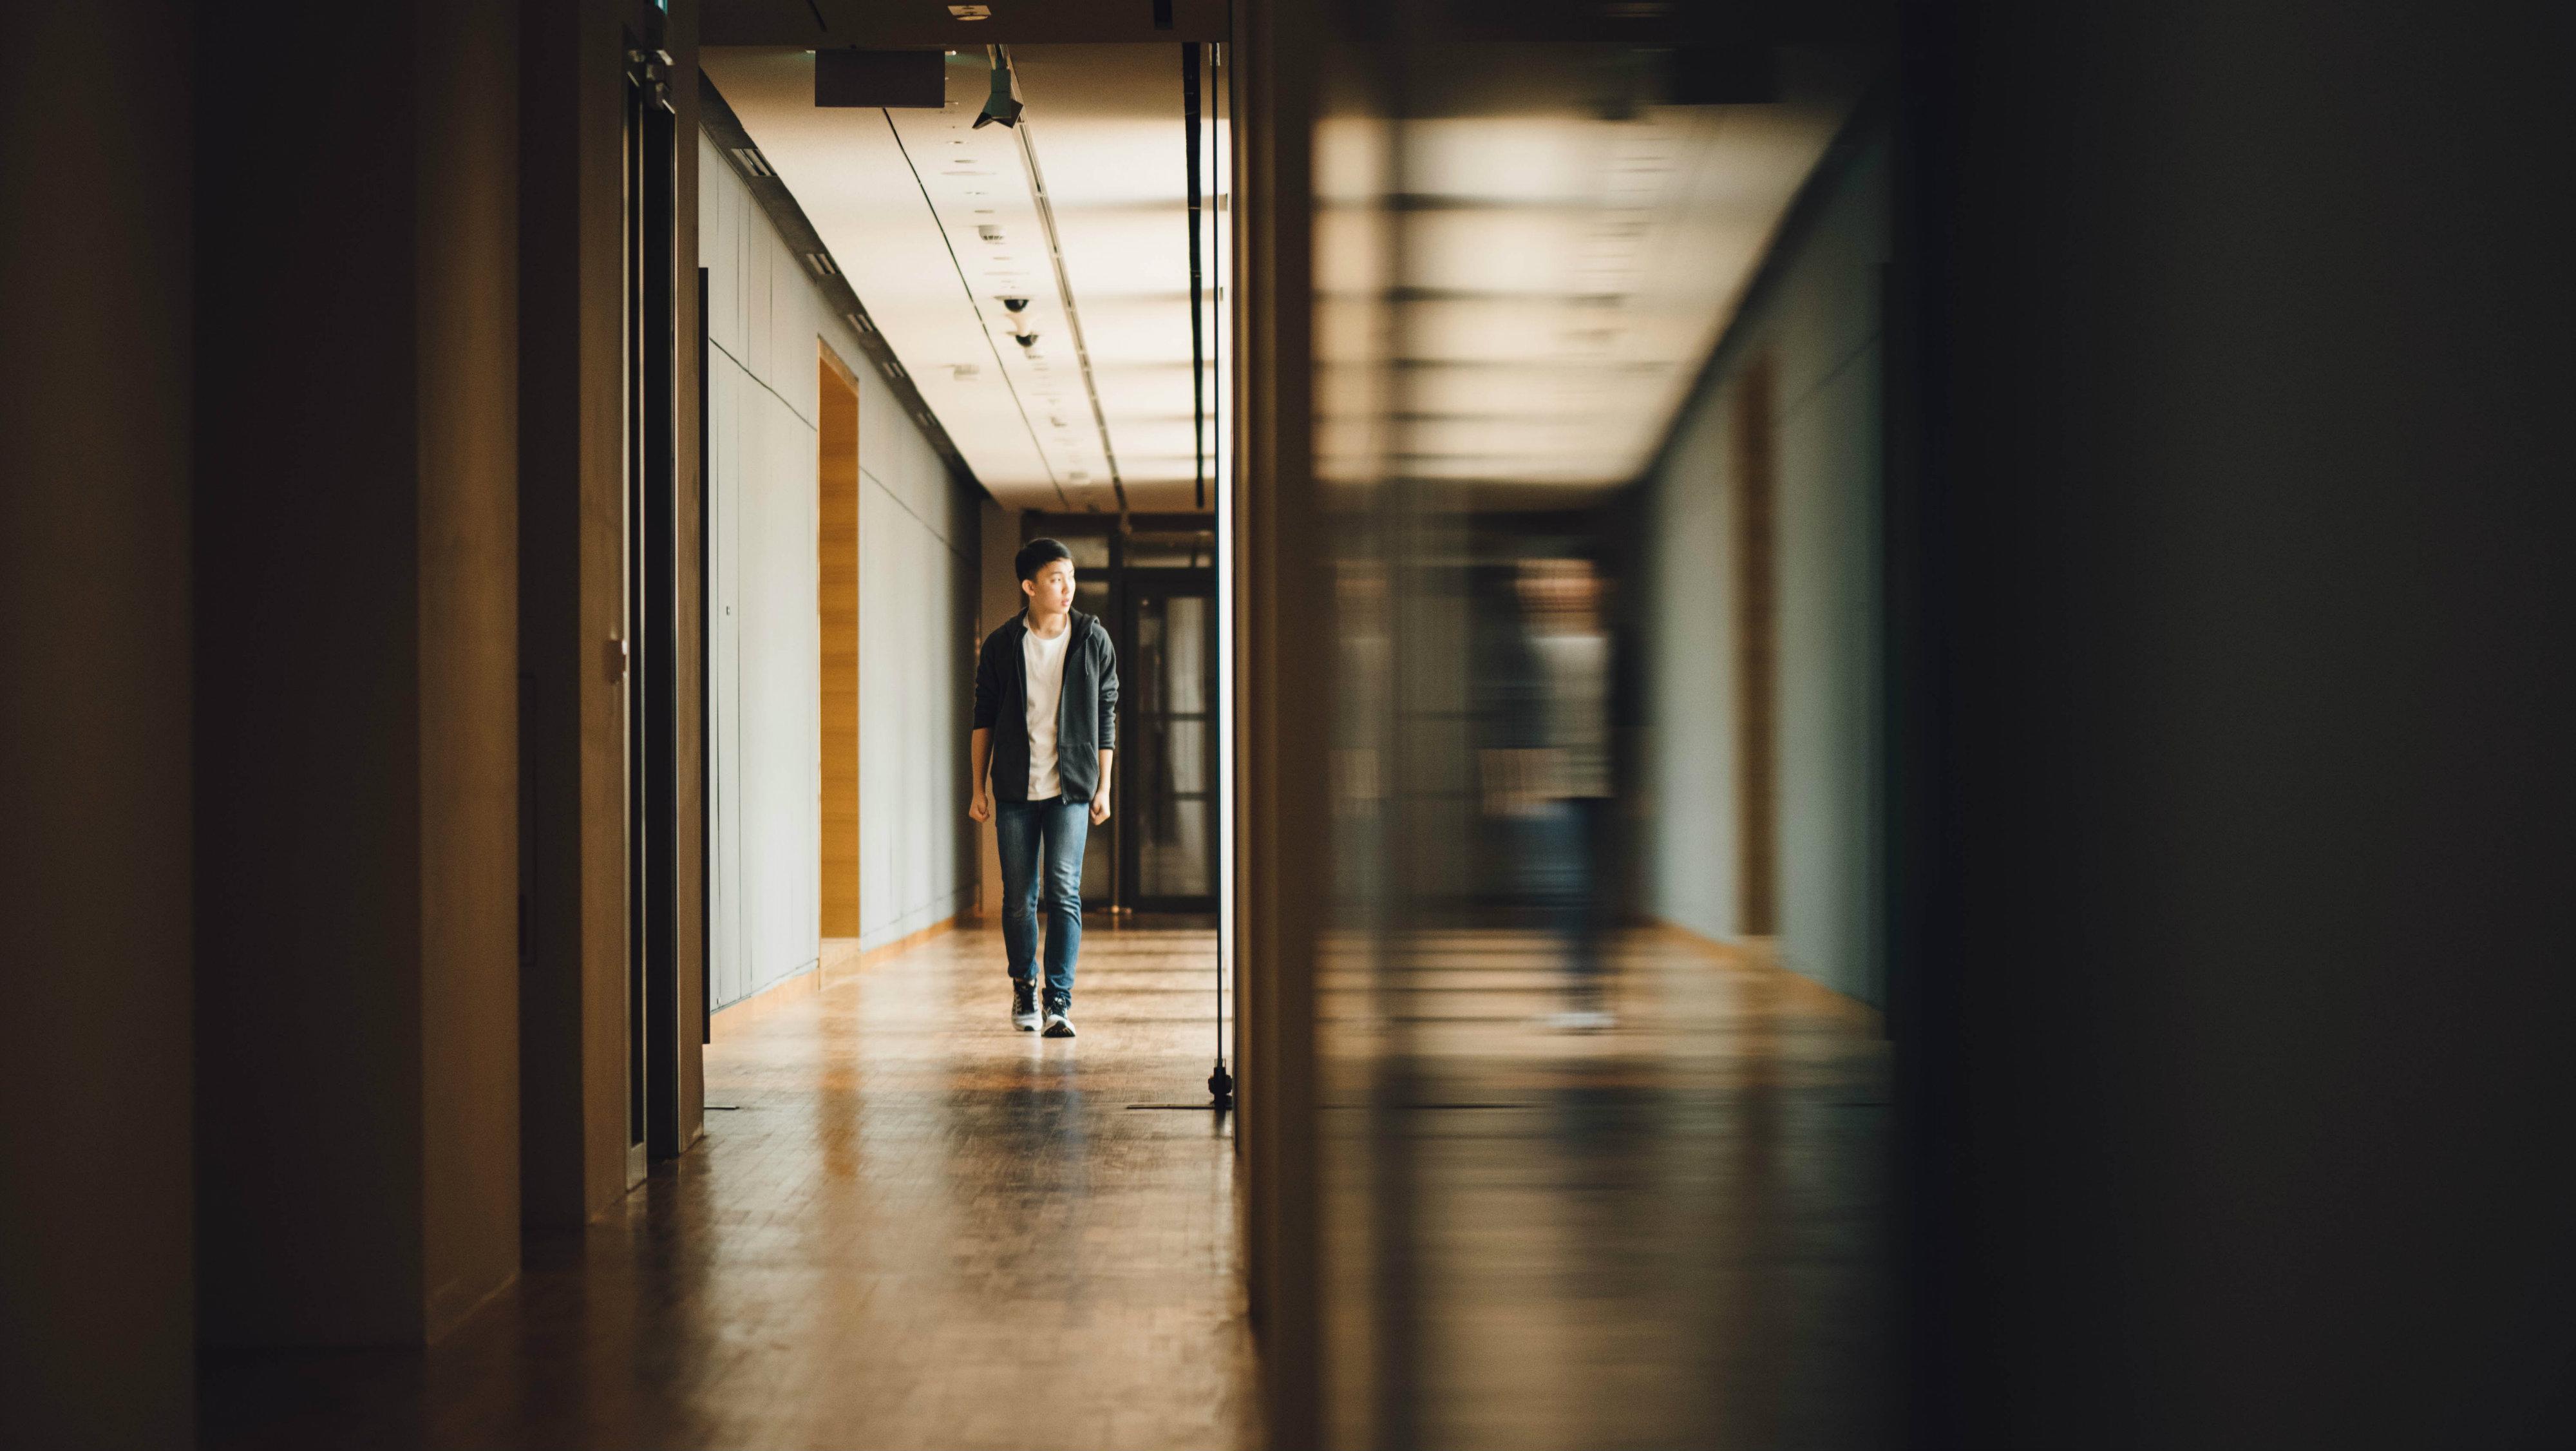 Teen walking in school hall.